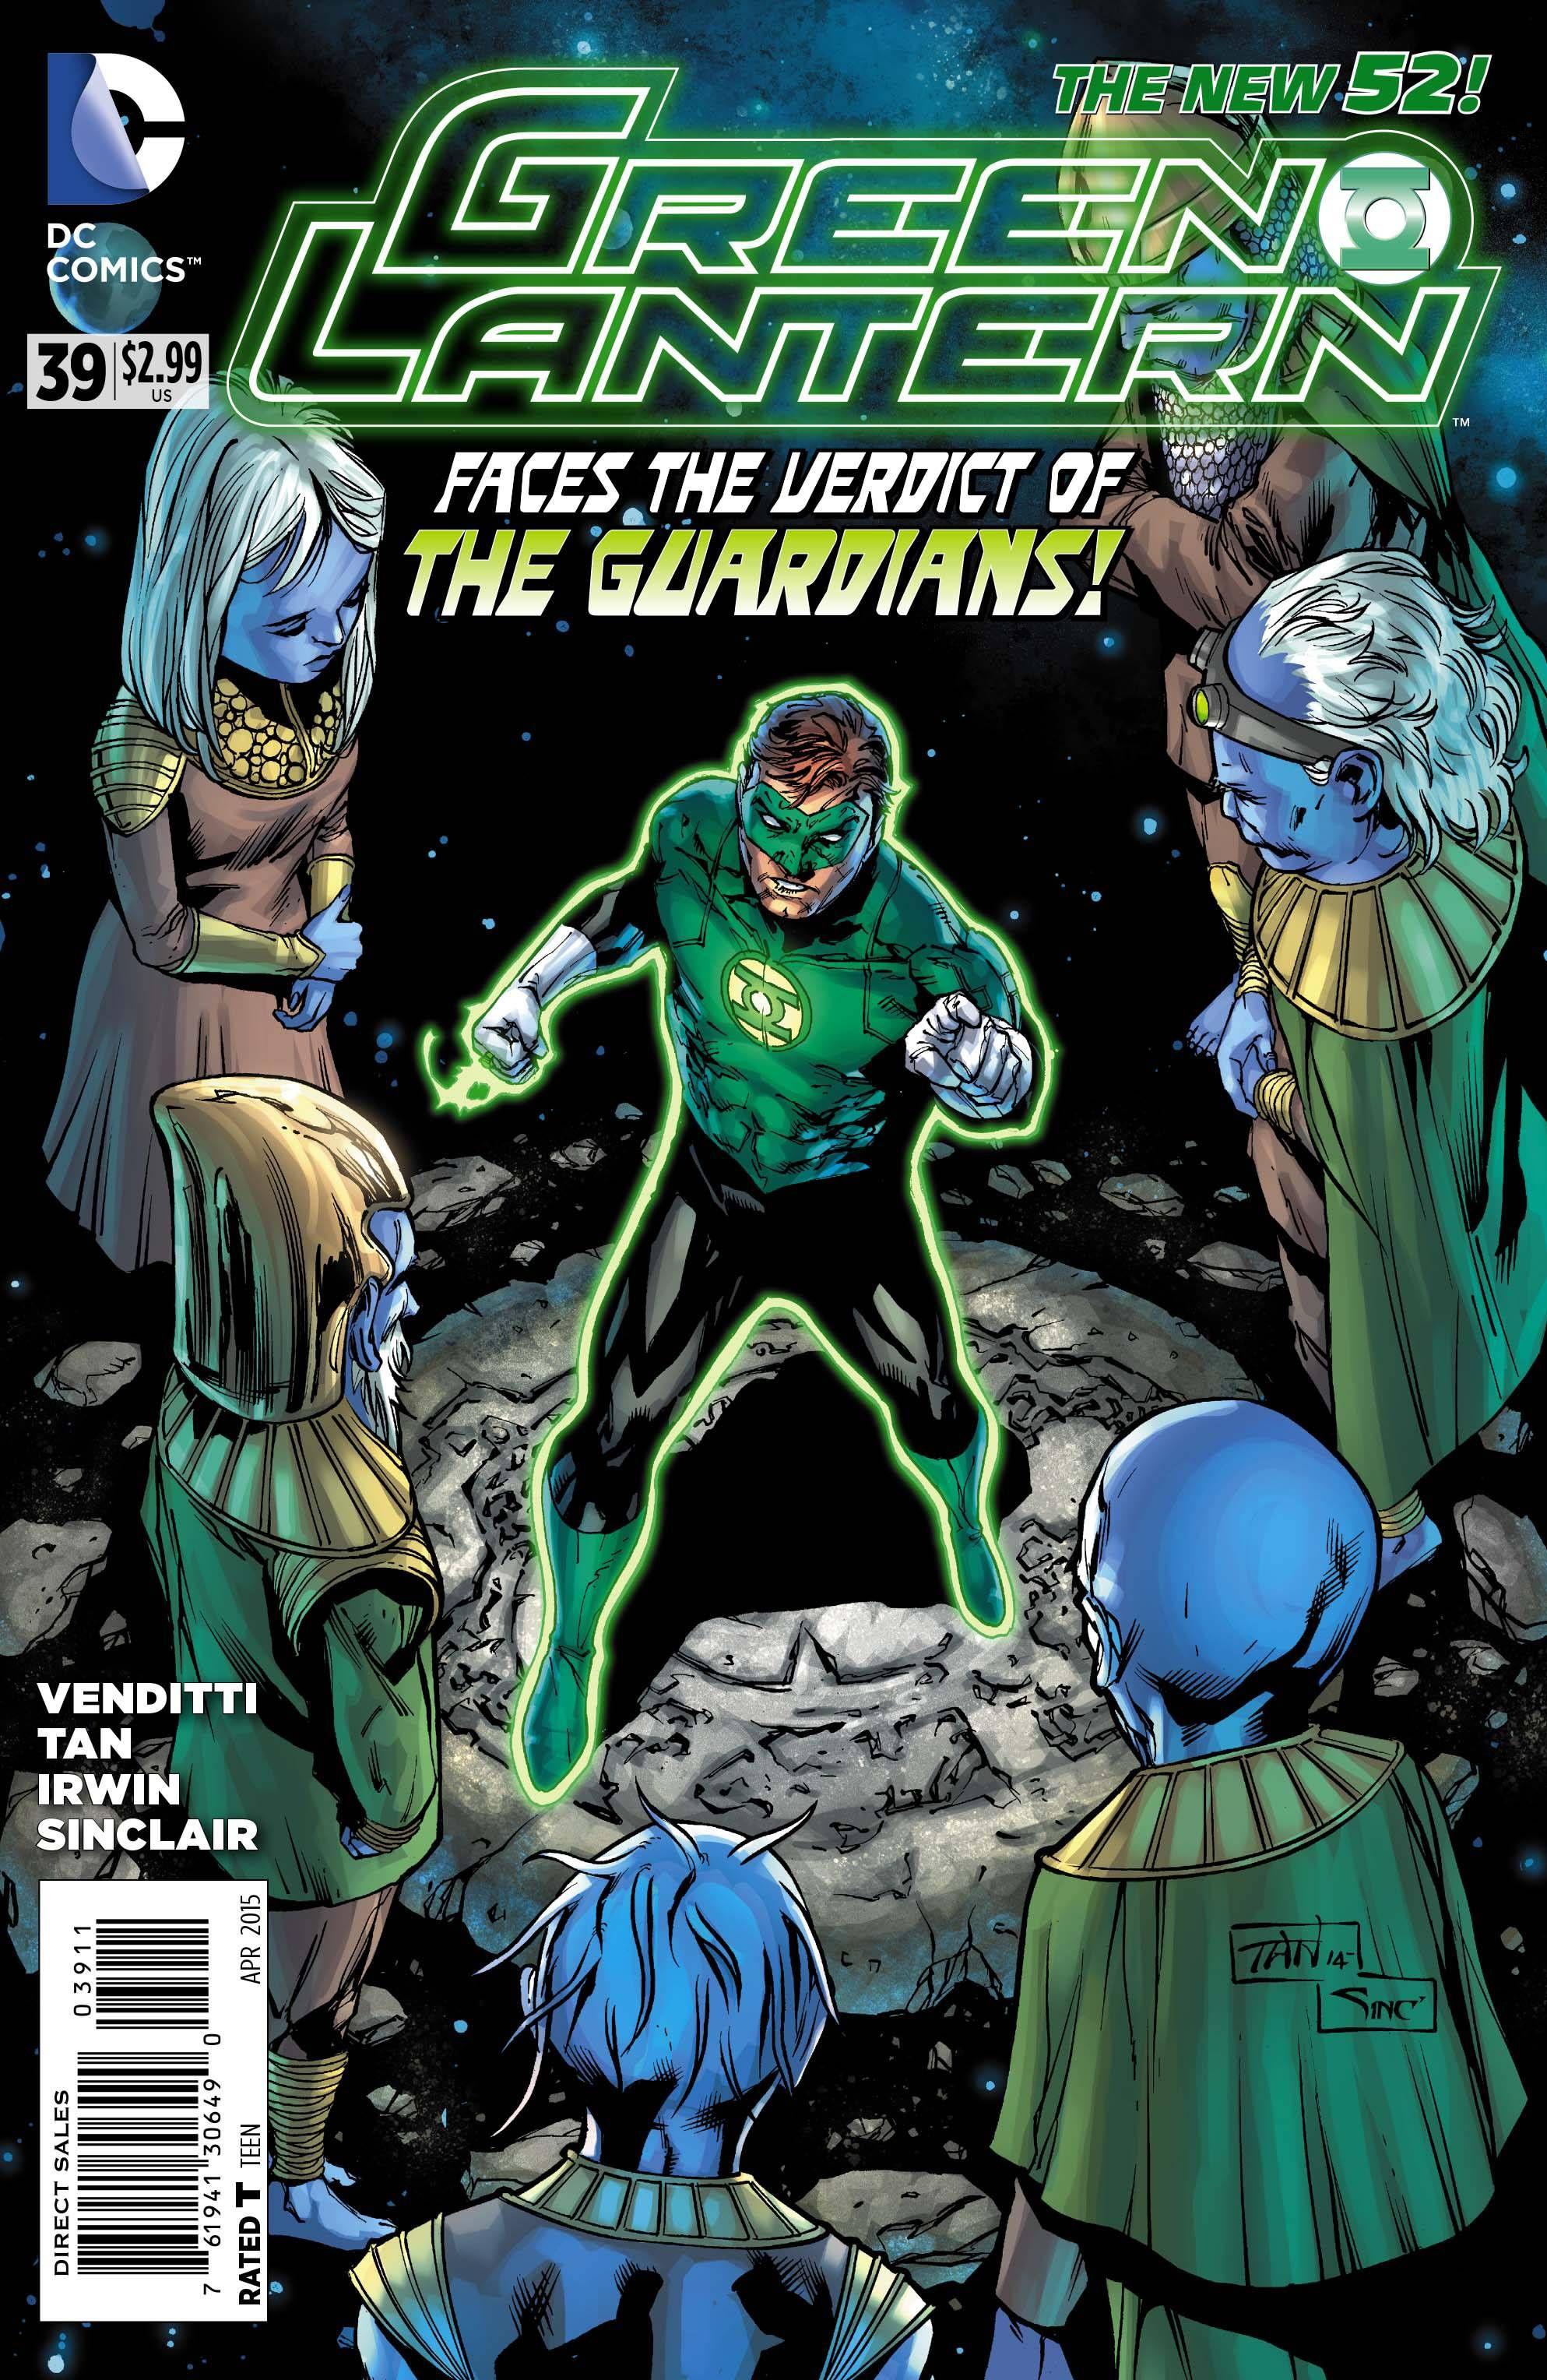 Green Lantern 39. Green lantern 2011, Dc comics artwork